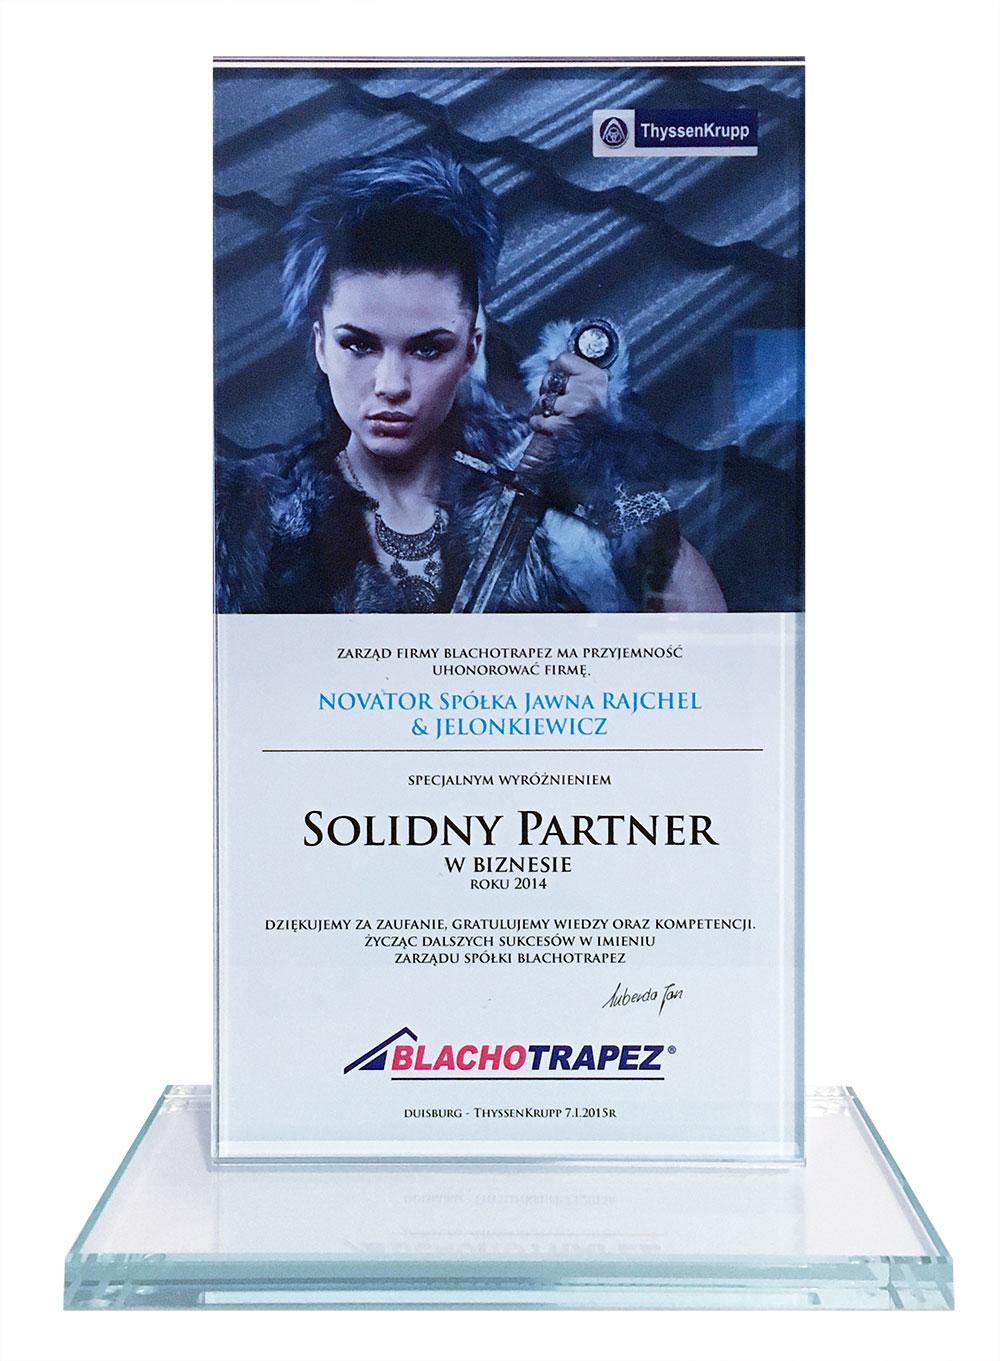 Blachotrapez Solidny Partner